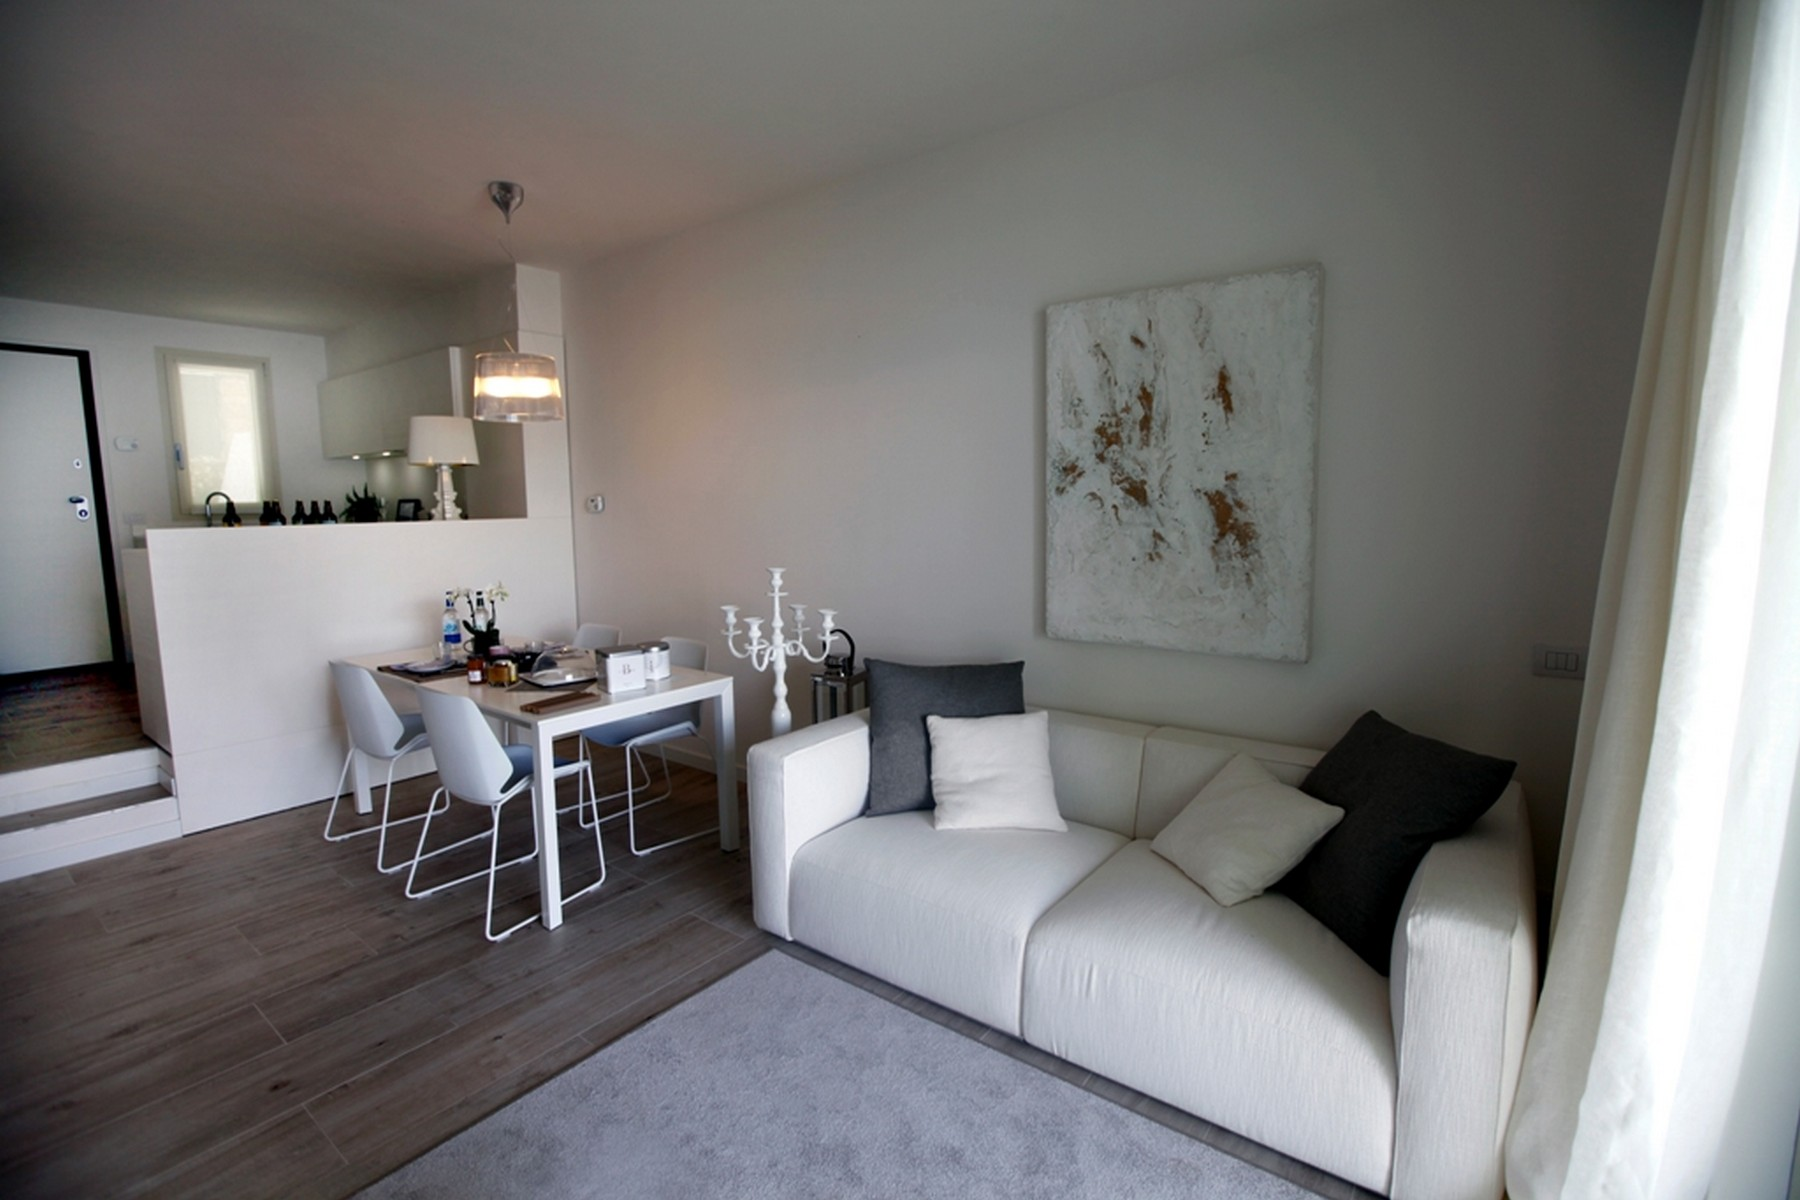 Additional photo for property listing at Splendid semi-independent villa directly on the lake Località Bagnana Lezzeno, Como 22025 Italia